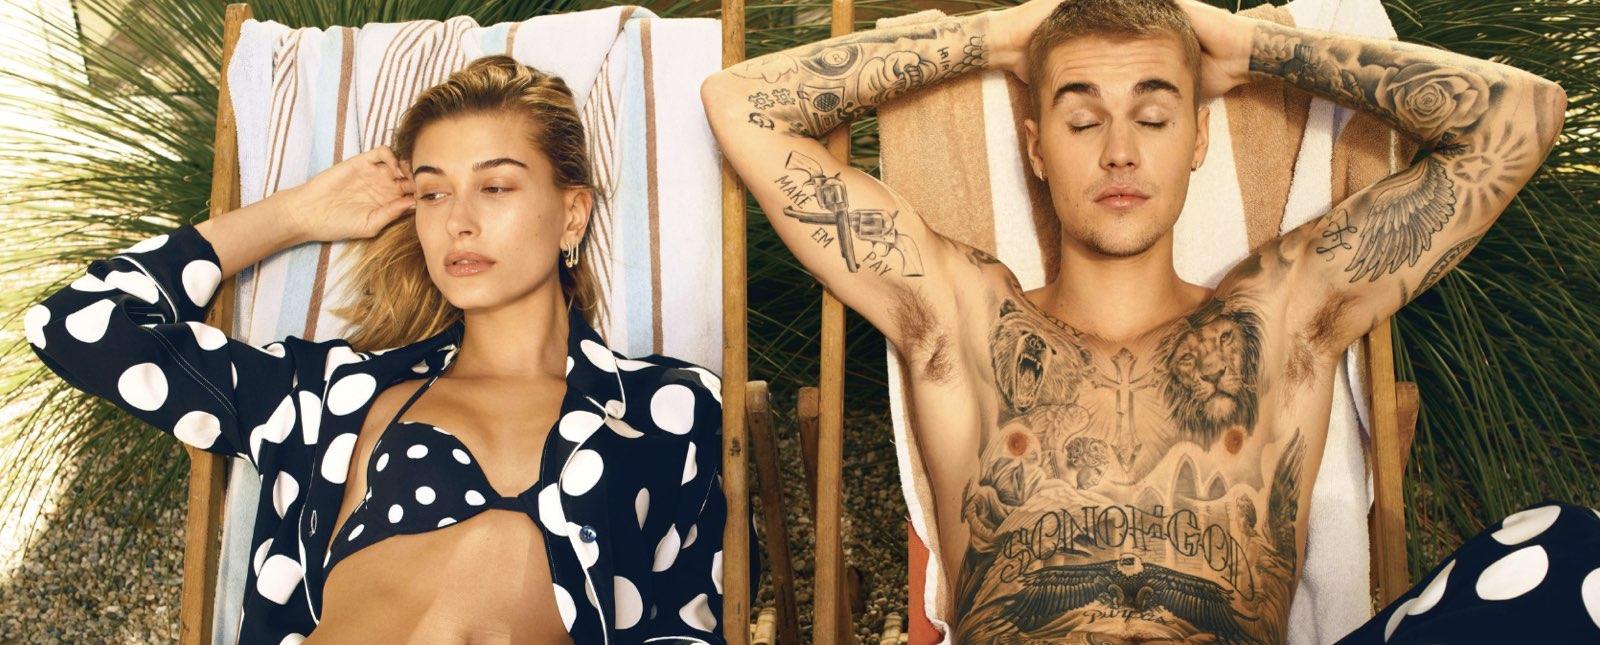 justin-bieber-hailey-baldwin-vogue-pictures-cover-annie-leibovitz-couple-goals